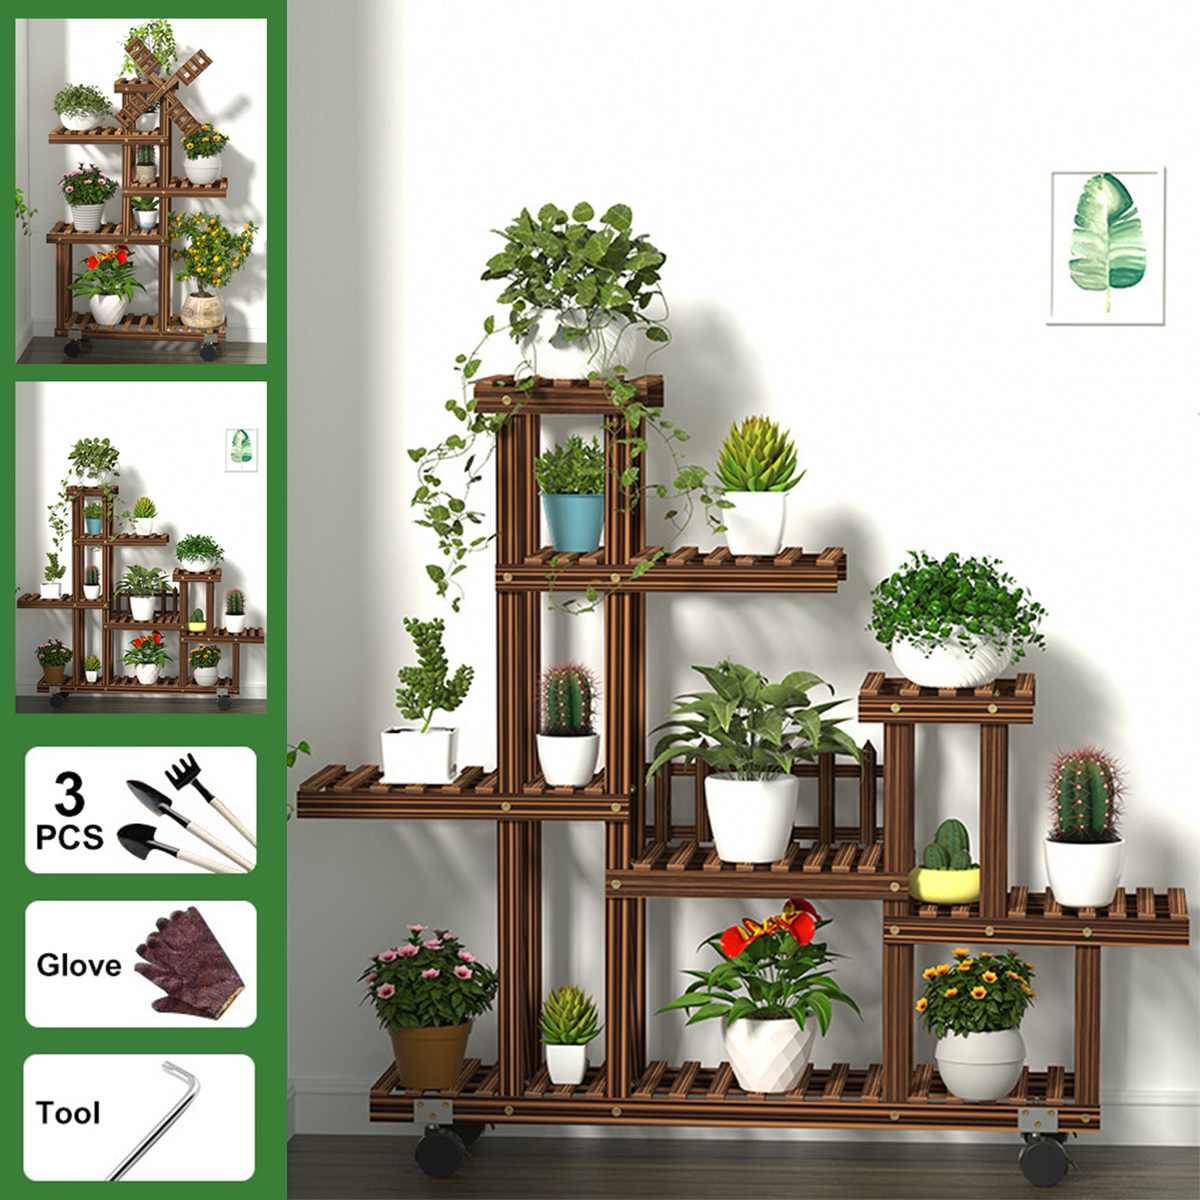 Multi-nivel de madera flor Rack con ruedas estante para plantas de flores estantes Bonsai estante patio jardín exteriores Decoración